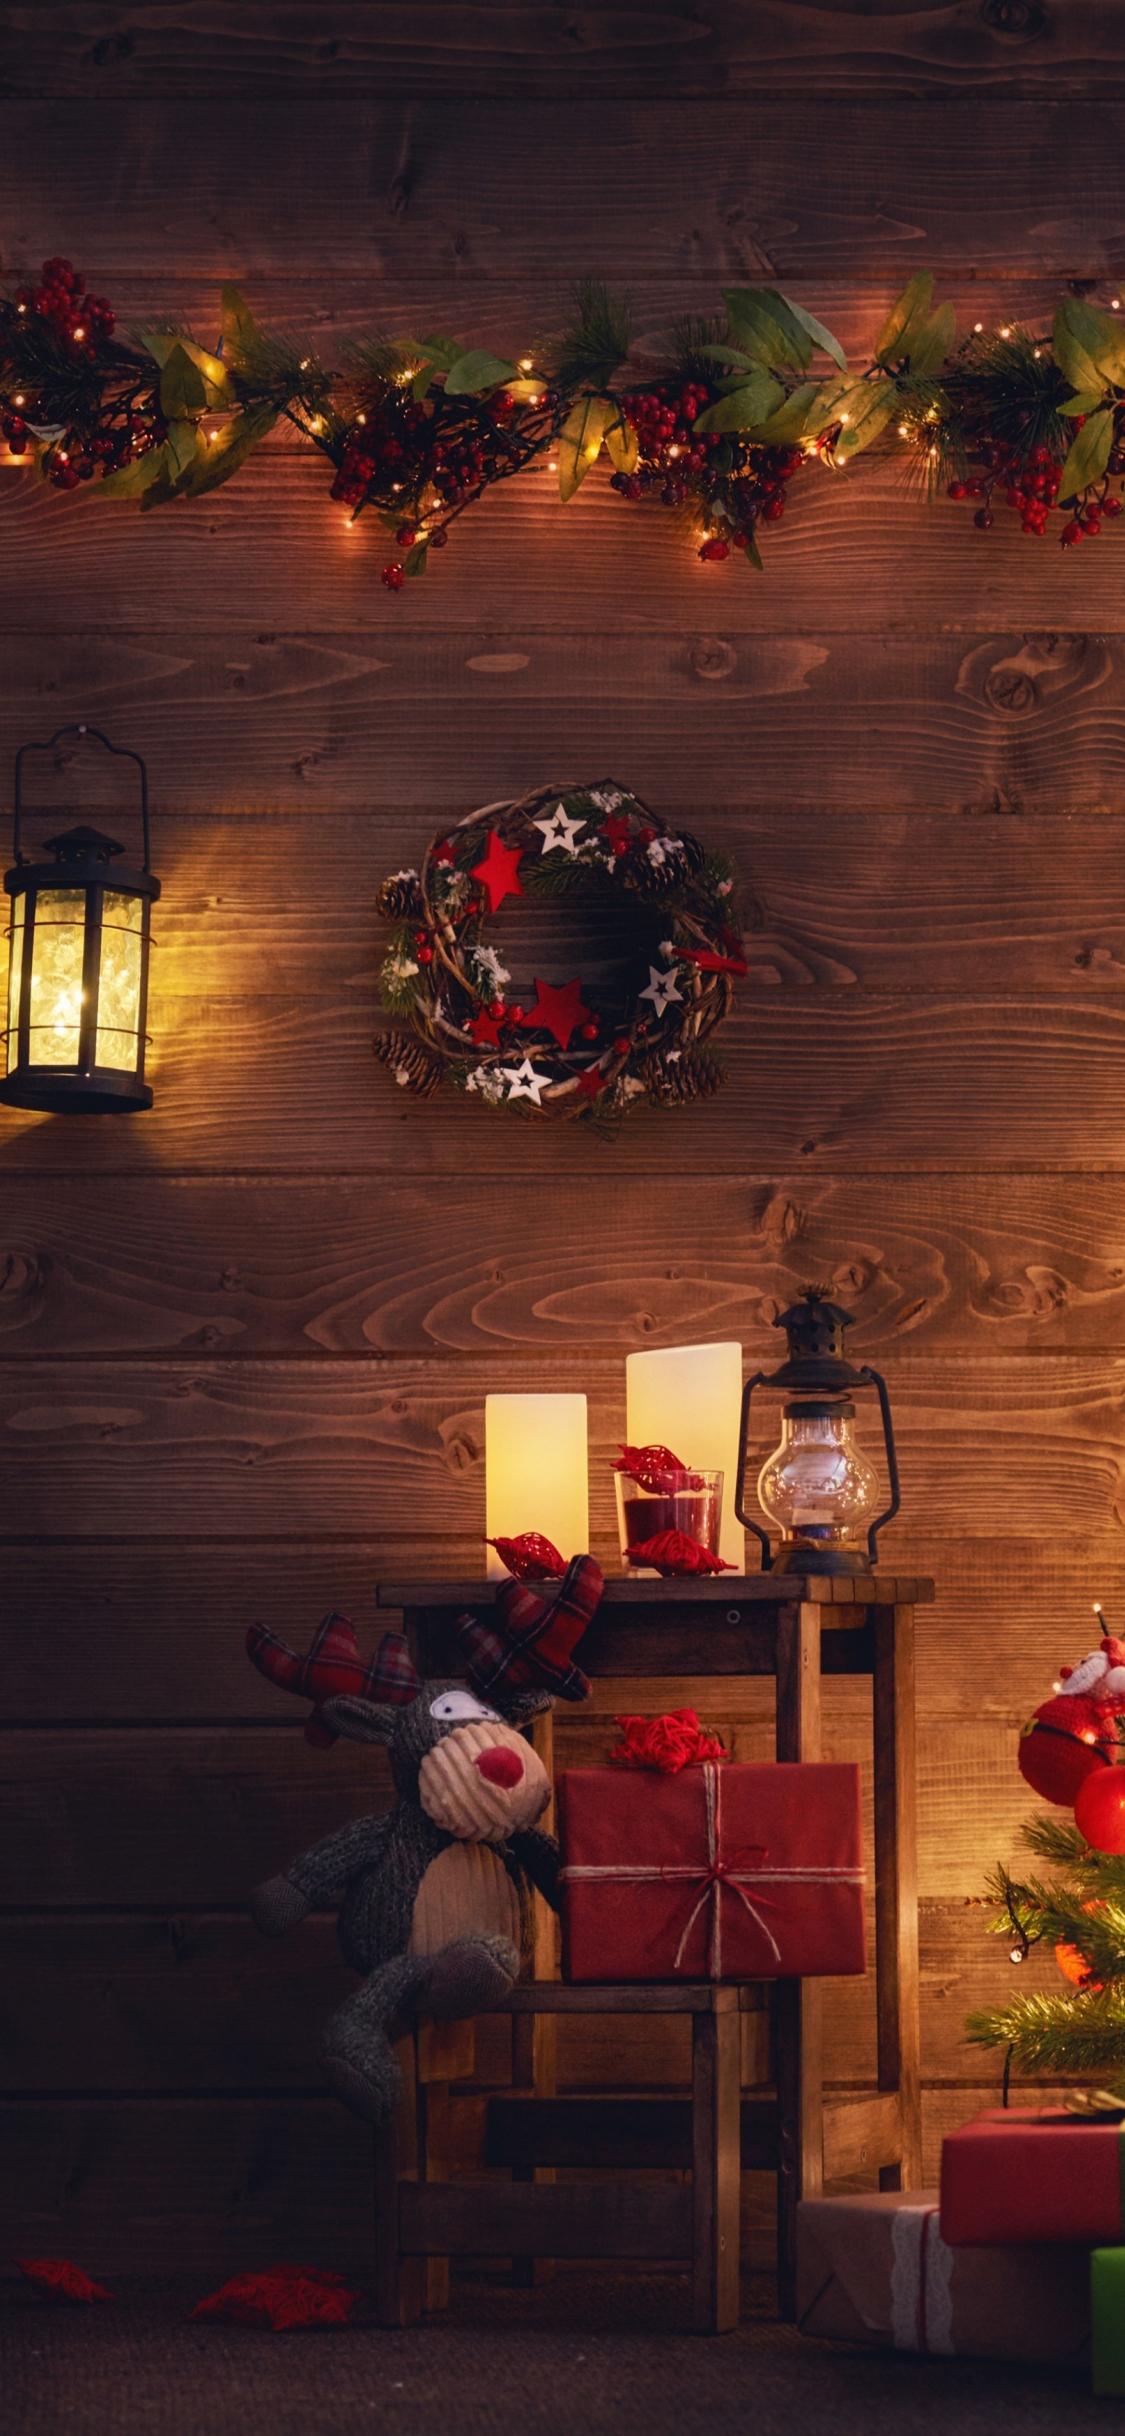 Download 1125x2436 Wallpaper Christmas Tree Holiday